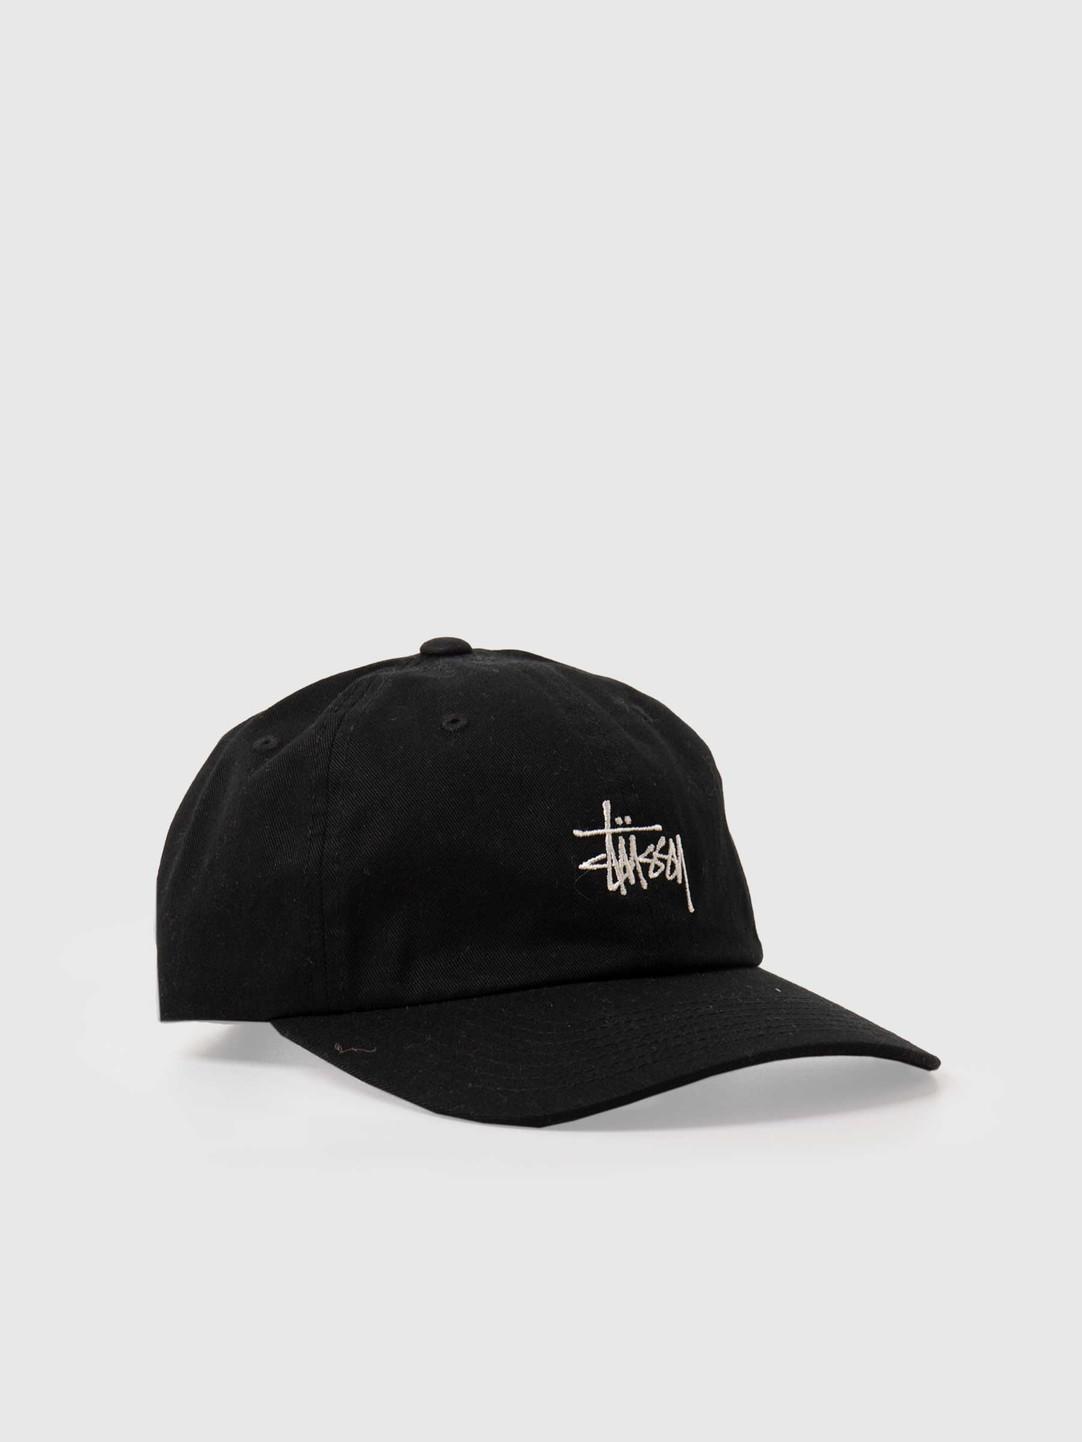 Stussy Stussy Stock Low Pro Cap Black 131955-0001